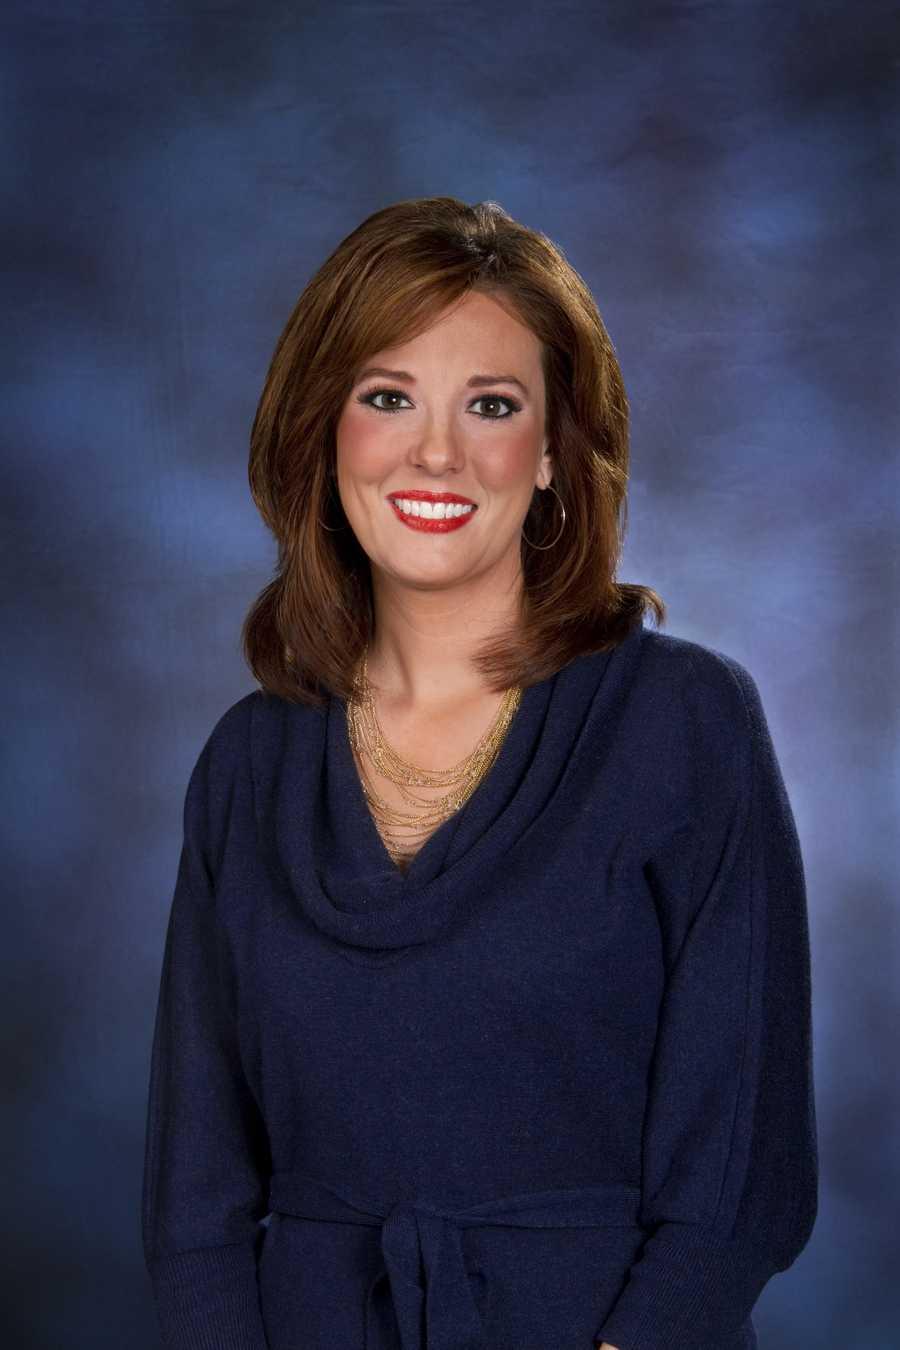 Action 7 News anchor Shelly Ribando remembers Christmas pajamas.